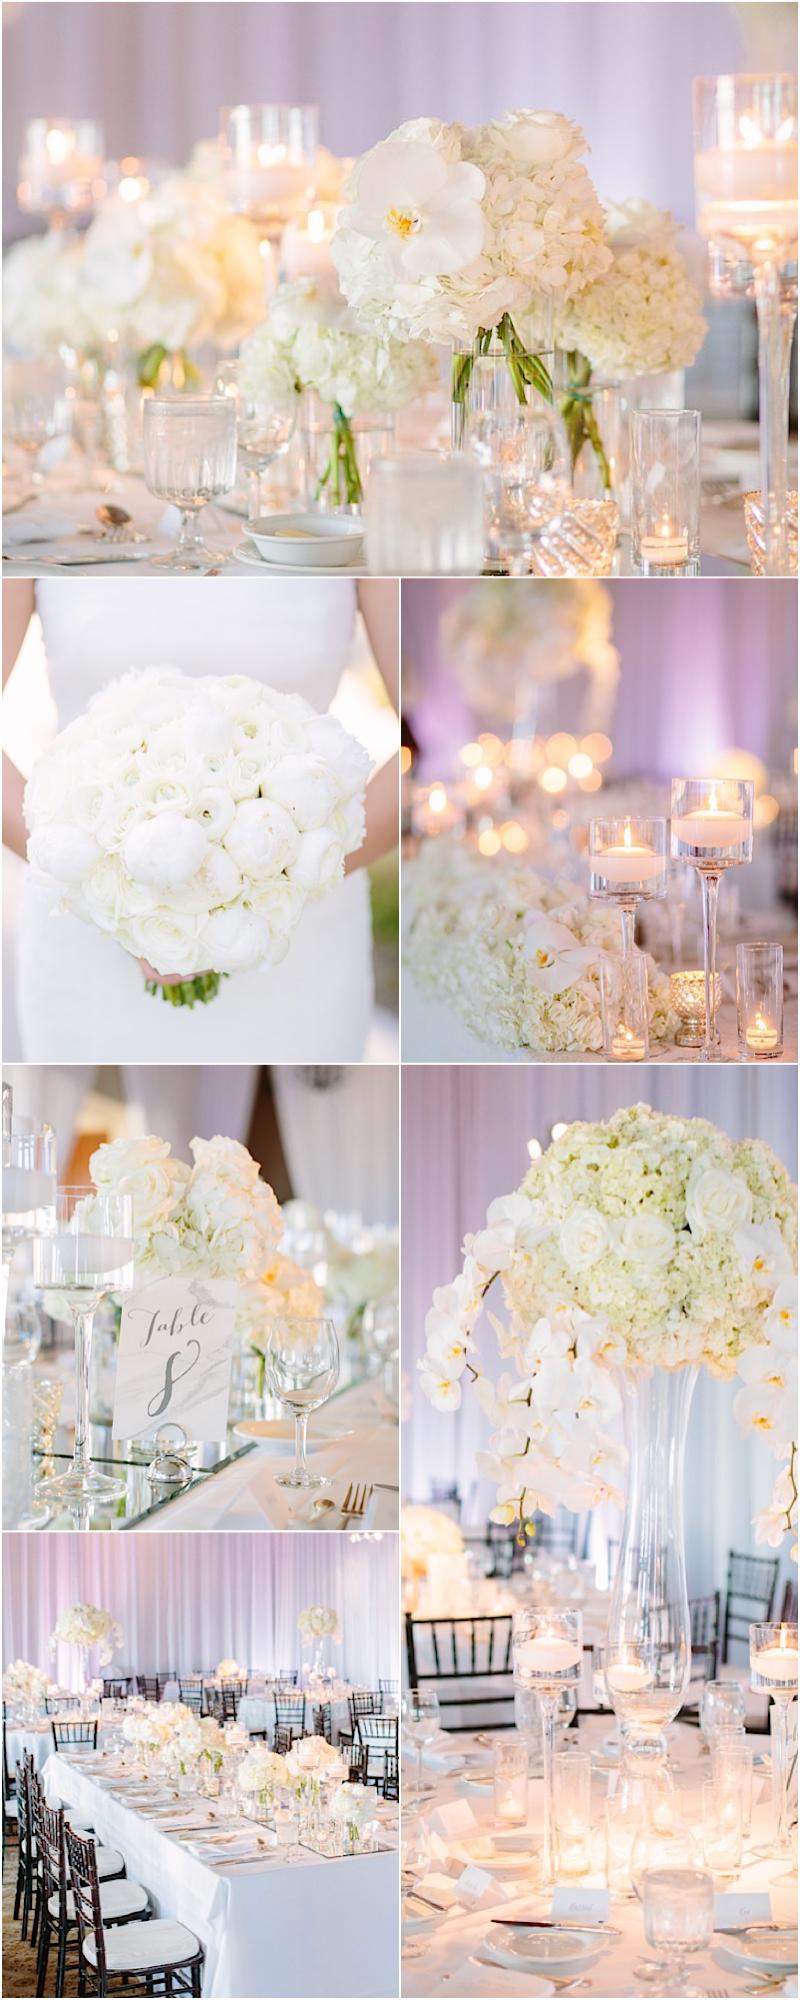 Malibu Wedding with All White Elegance   Reception, Photographers ...